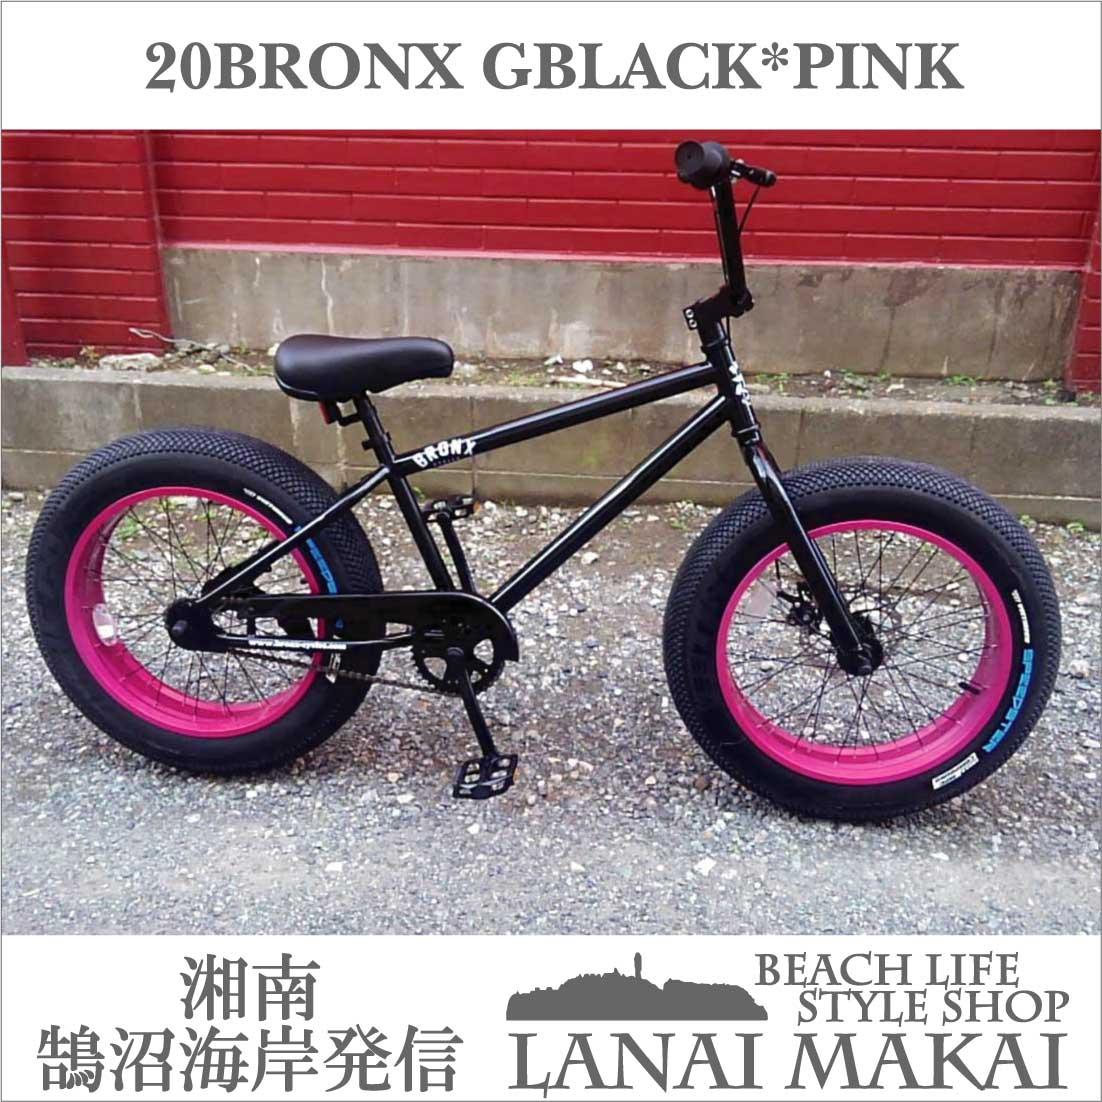 "【MODEL】""BRONX 20nch FAT-BIKES""""湘南鵠沼海岸発信""20inchファットバイク《RAINBOW BRONX 20inchFAT-BIKES》COLOR:グロスブラック×ピンクリム自転車 ファットバイク メンズ レディース 20インチ レインボー BRONX"